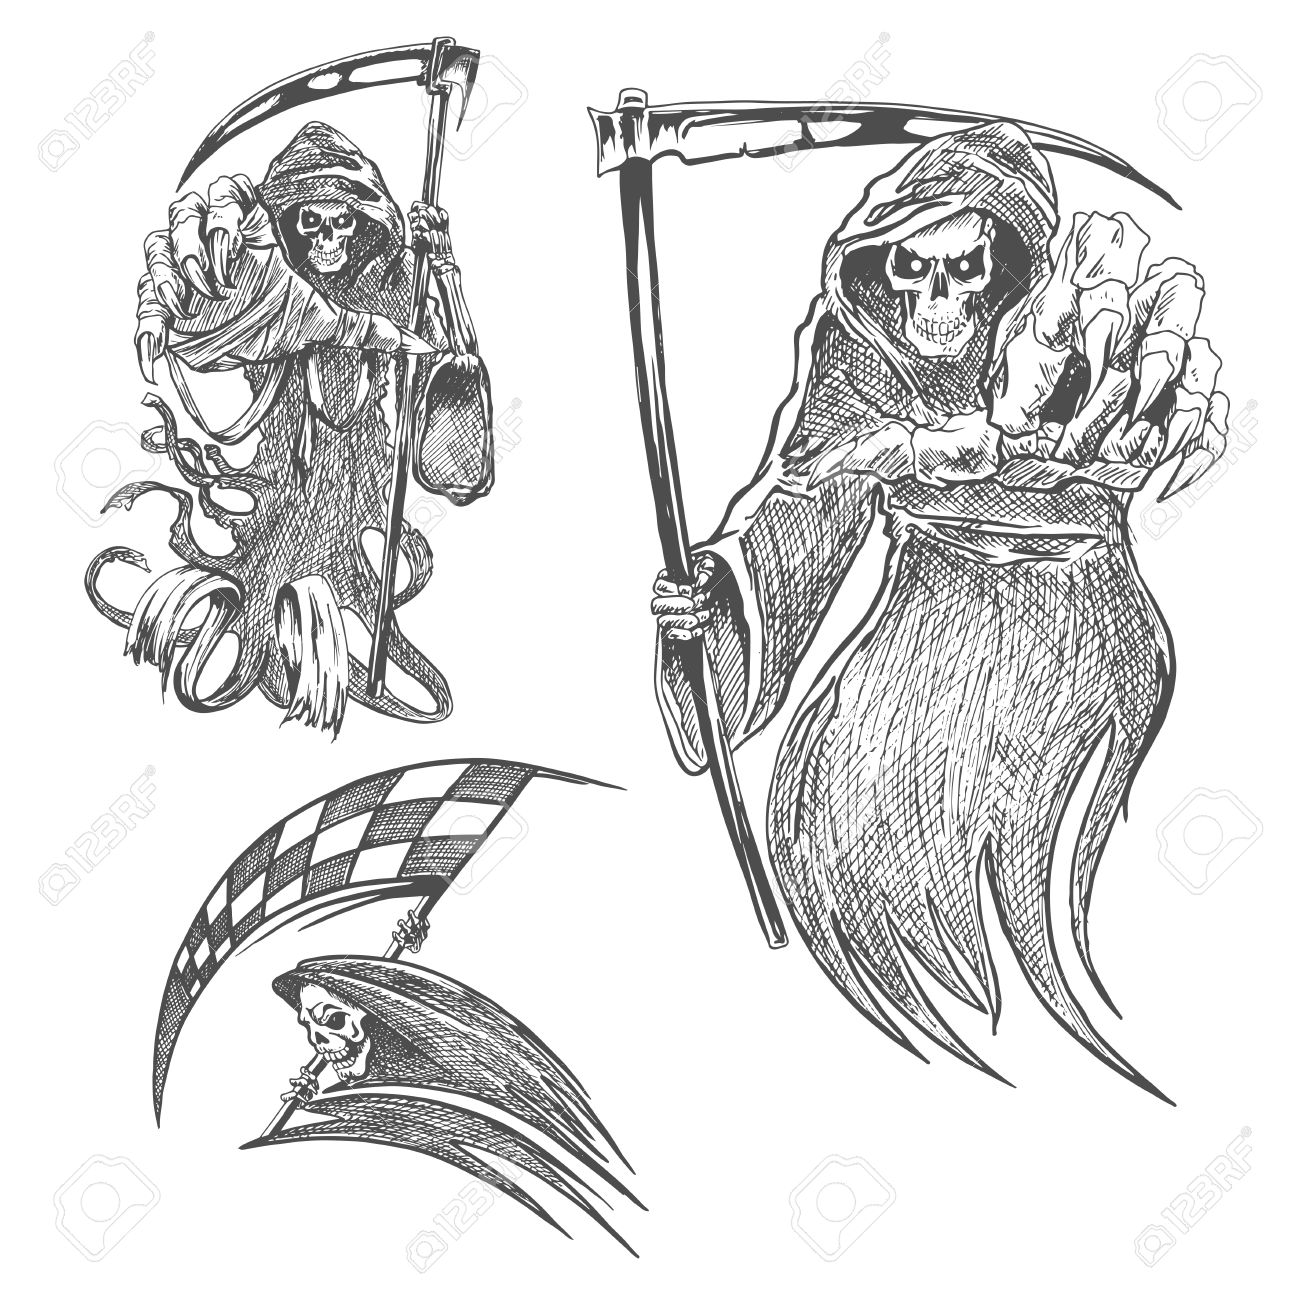 1300x1300 Death With Scythe Pencil Sketch. Halloween Vector Icon. Gothic